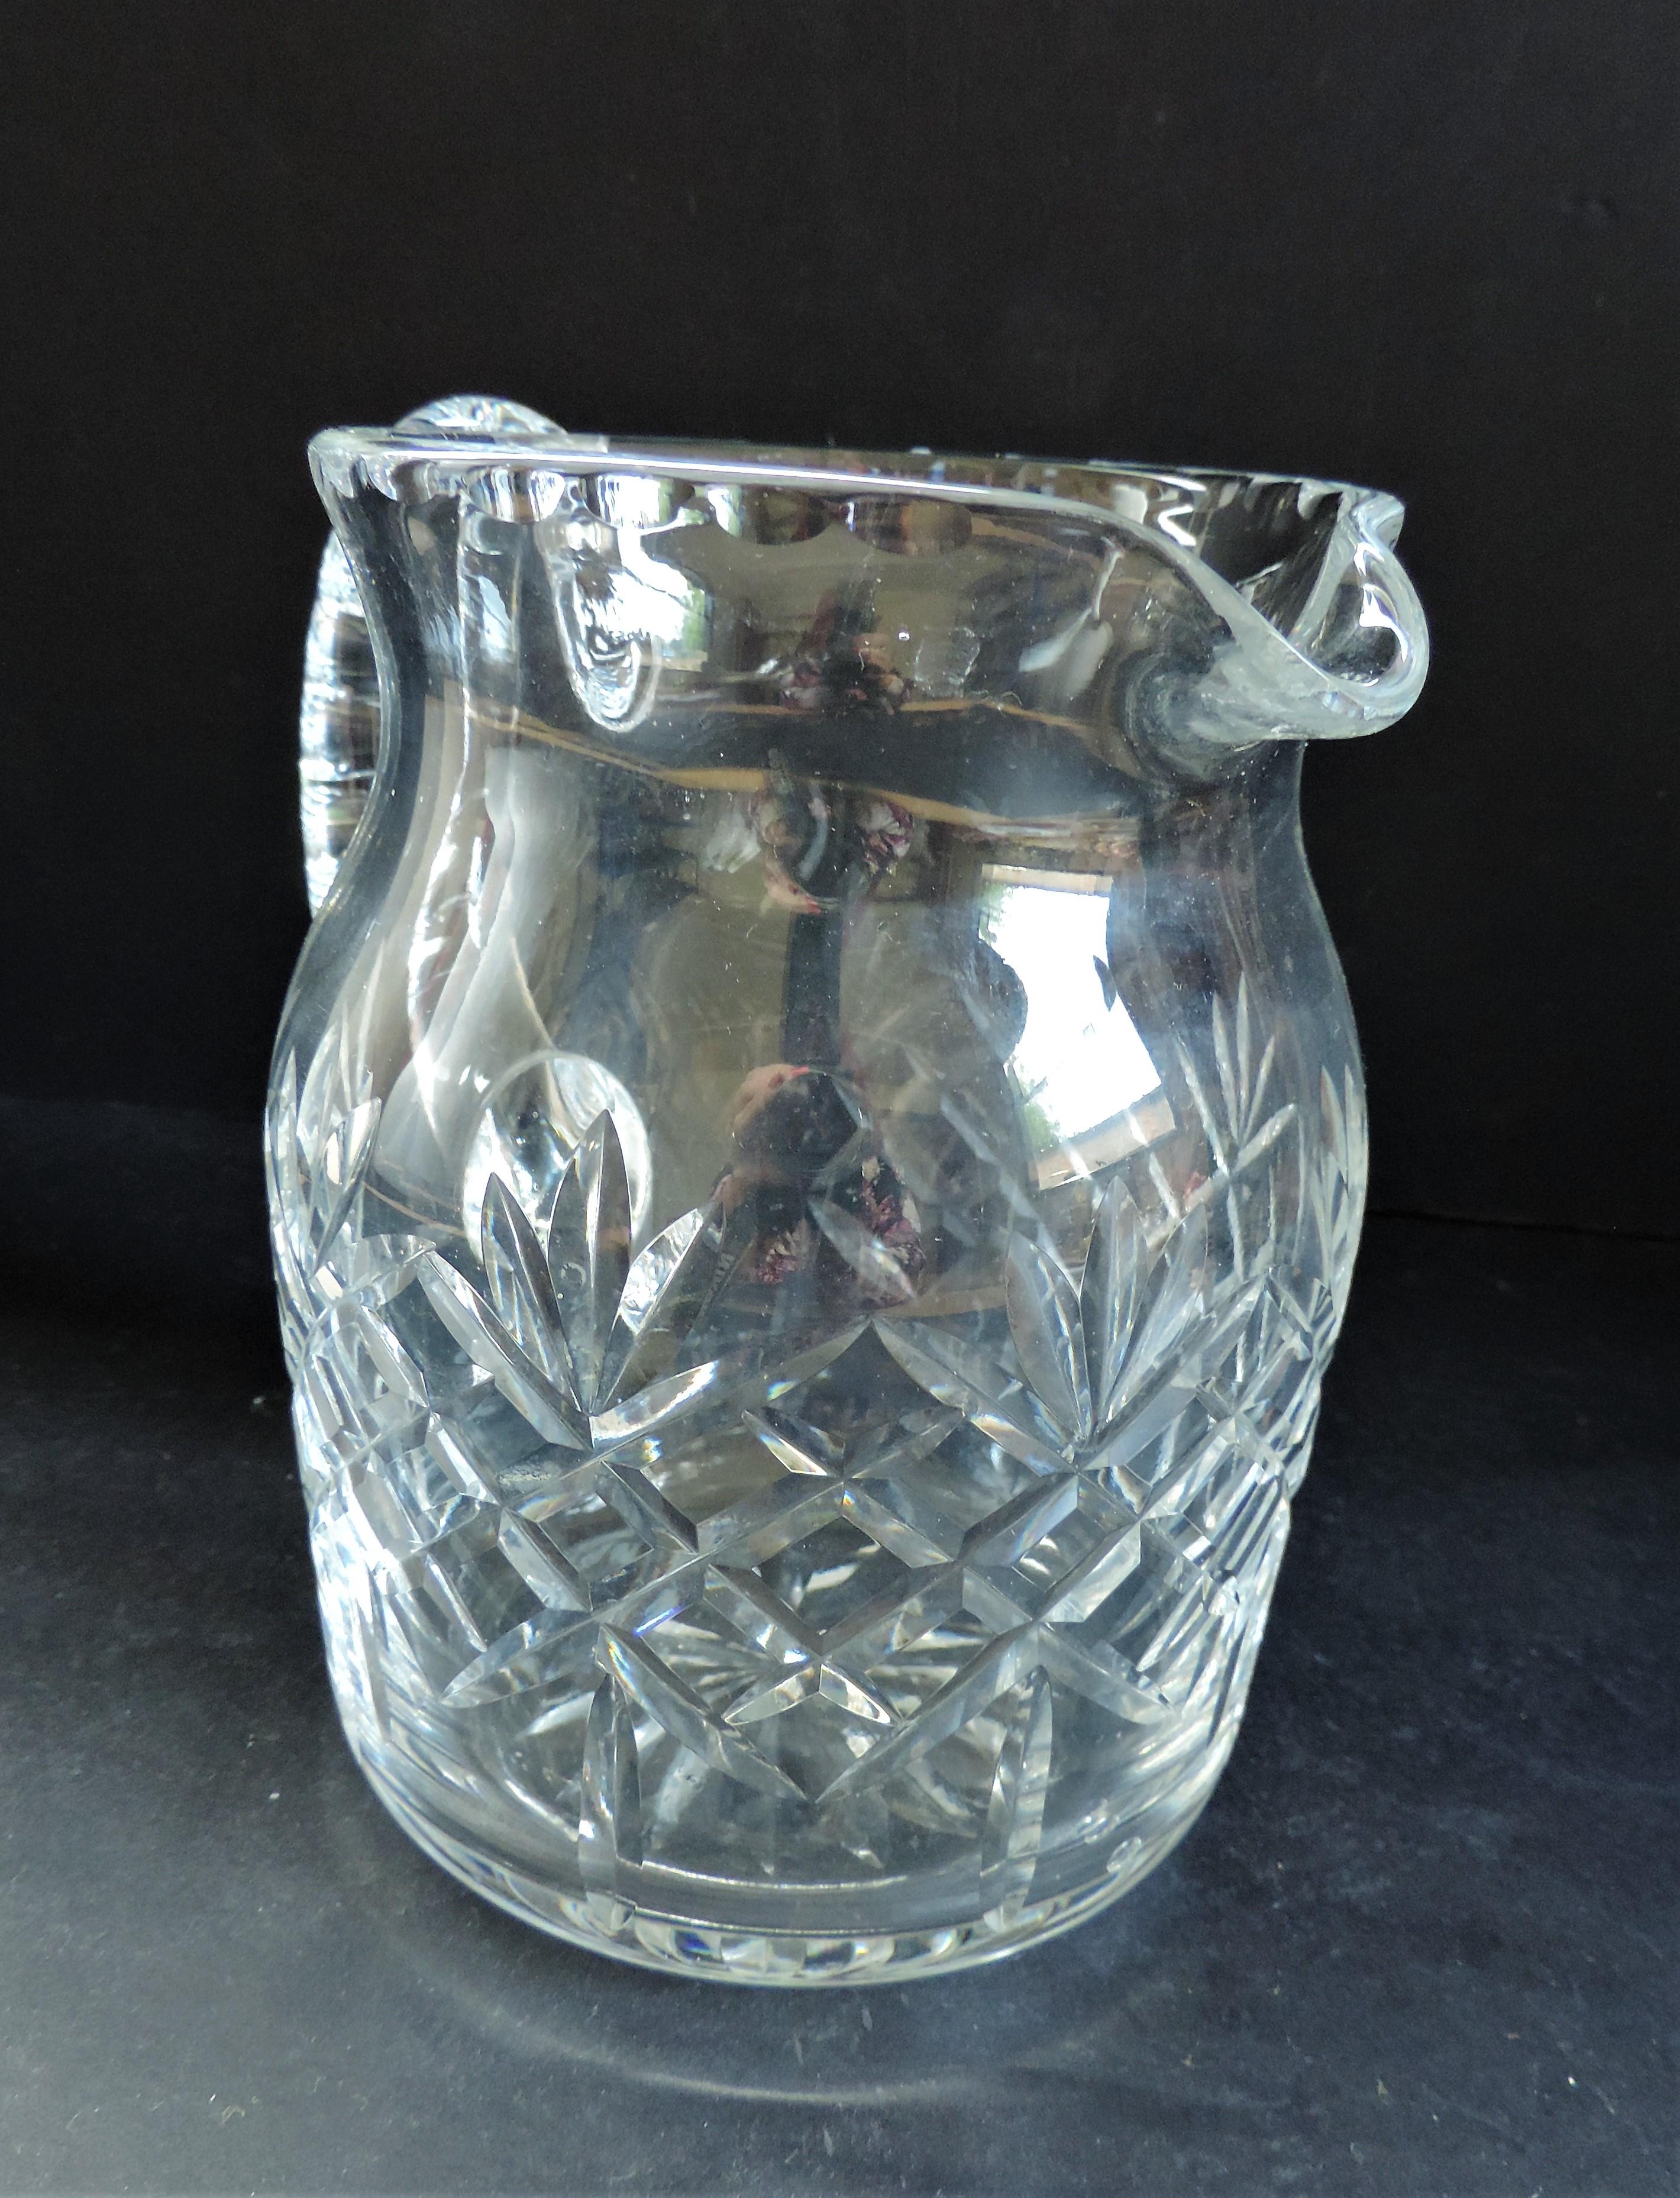 Vintage Crystal Drinks Jug/Pitcher 15cm tall - Image 3 of 5